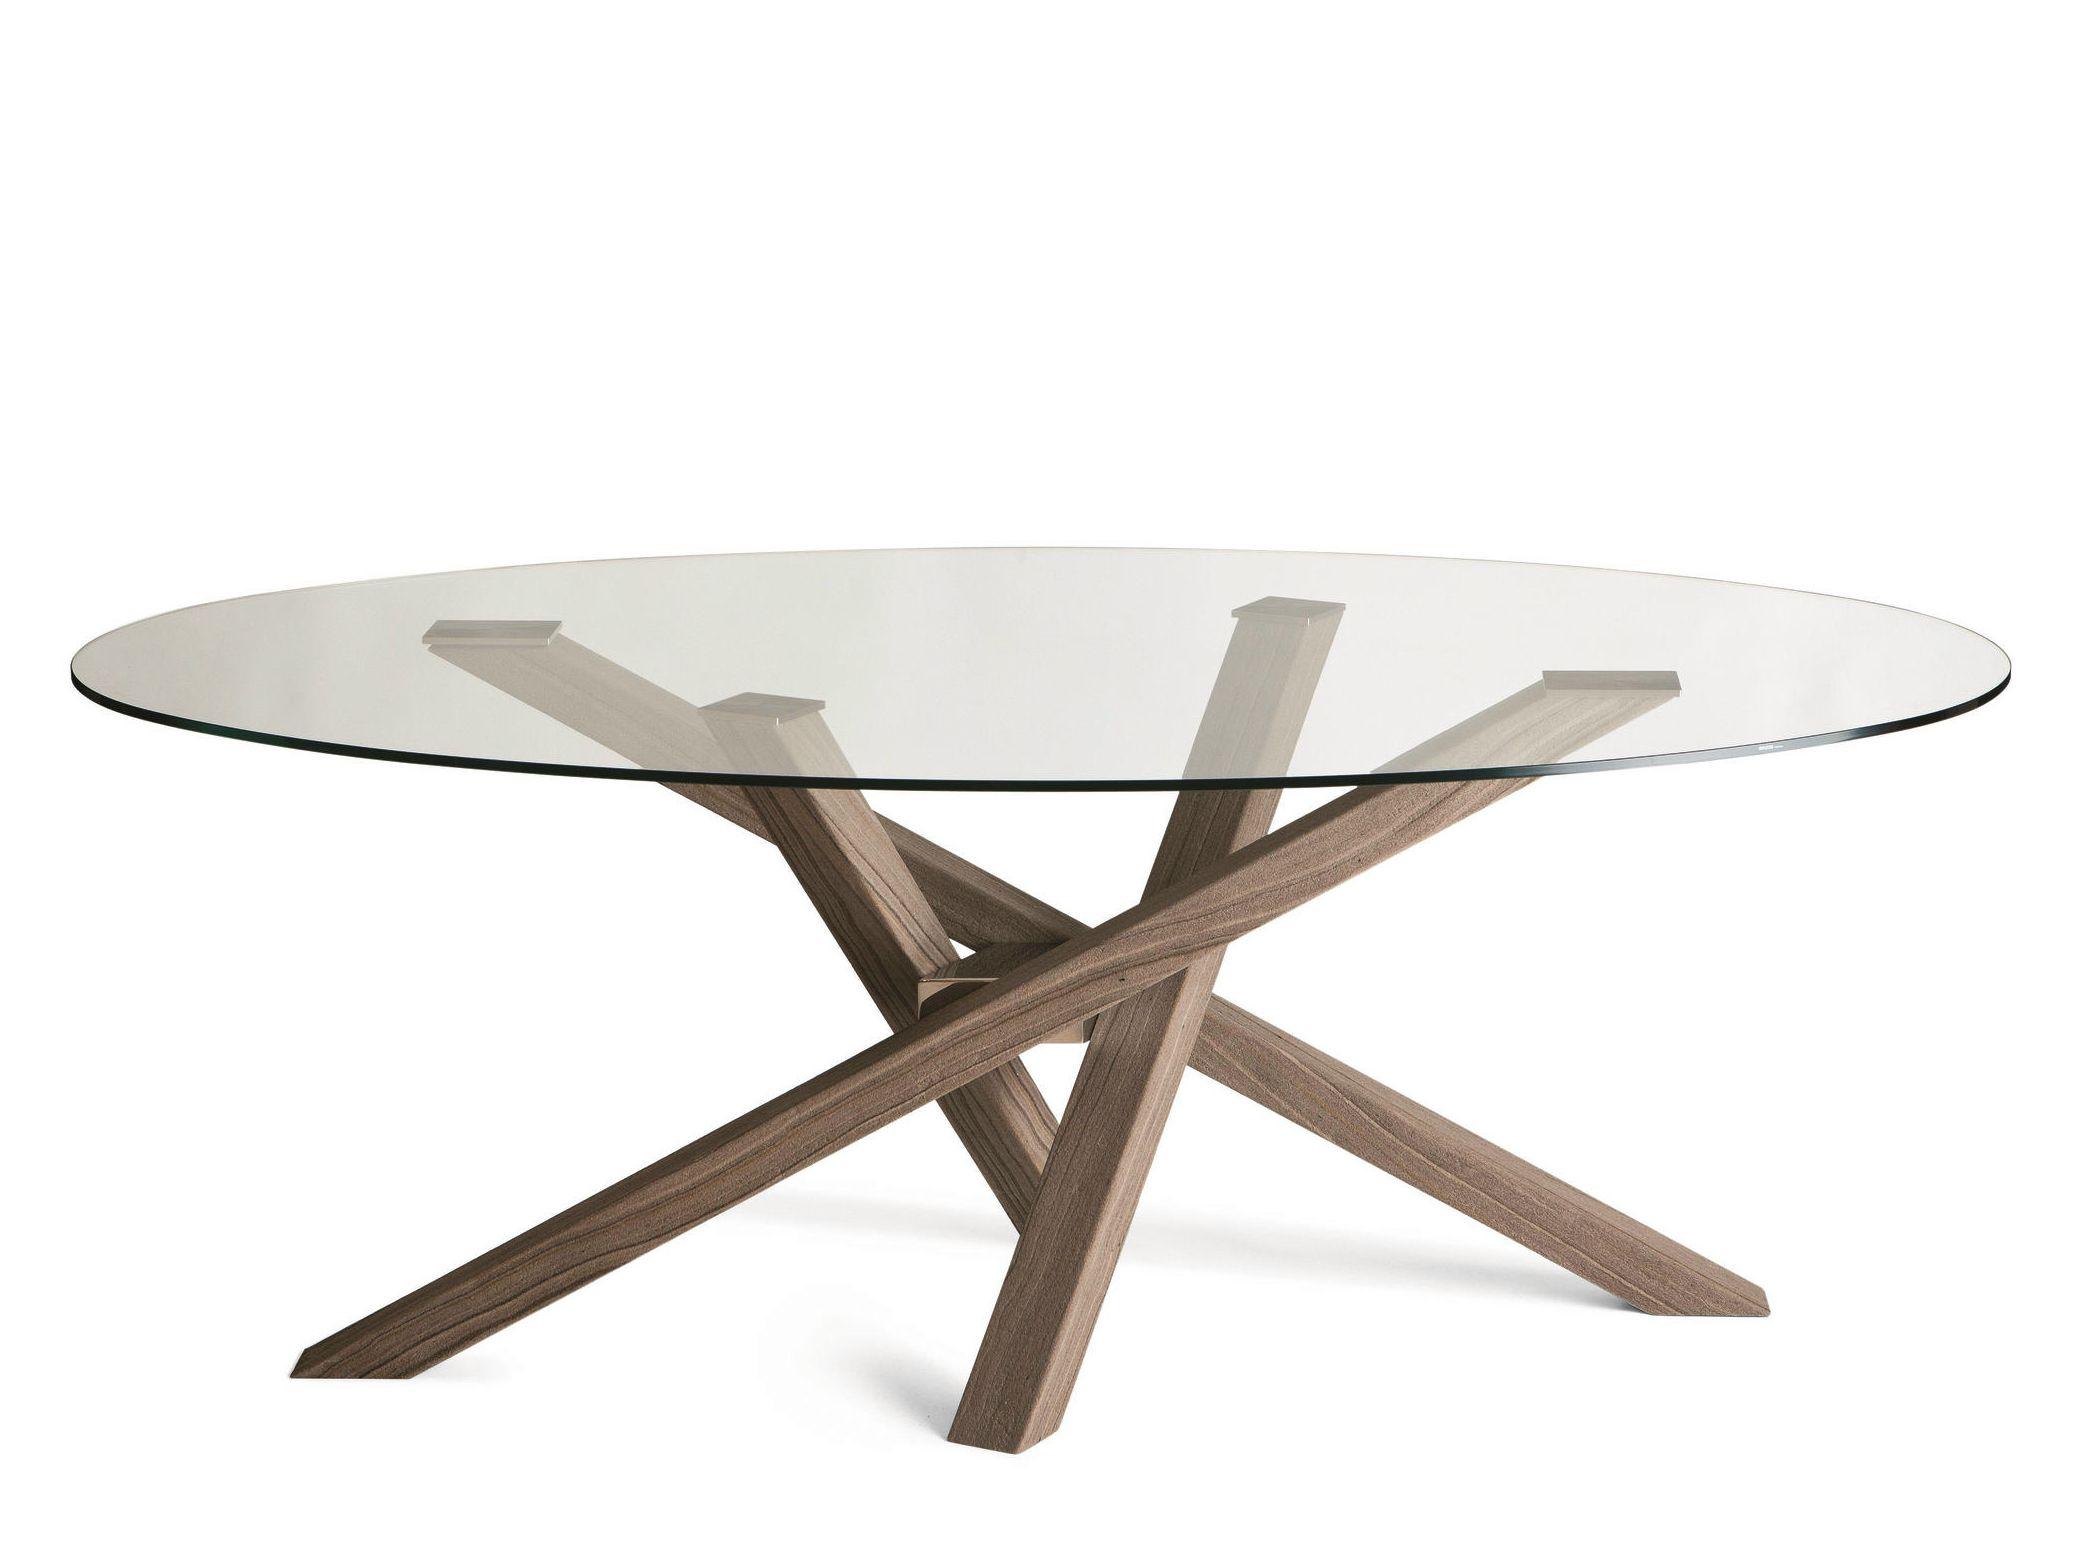 Table en bois et verre collection shangai by riflessi - Tavolo riflessi prezzi ...